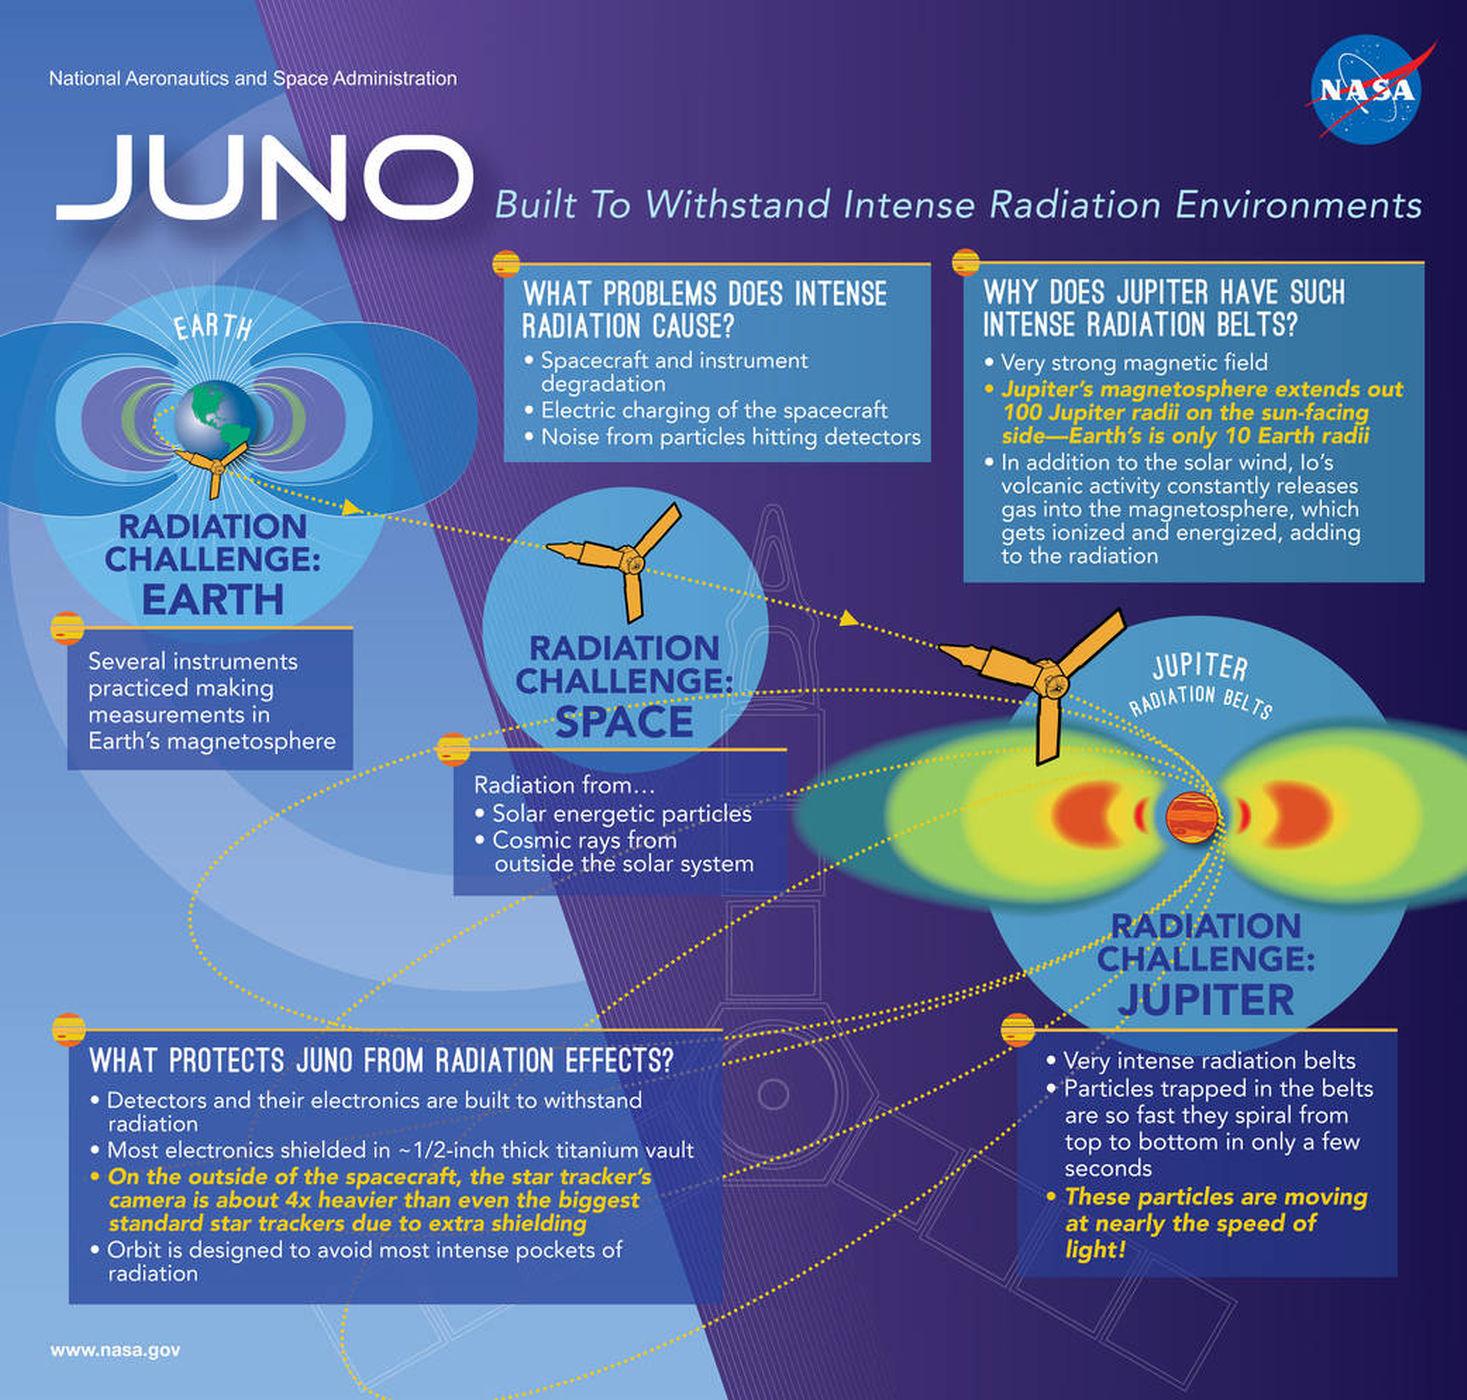 juno-jupiter-radiation-infographic